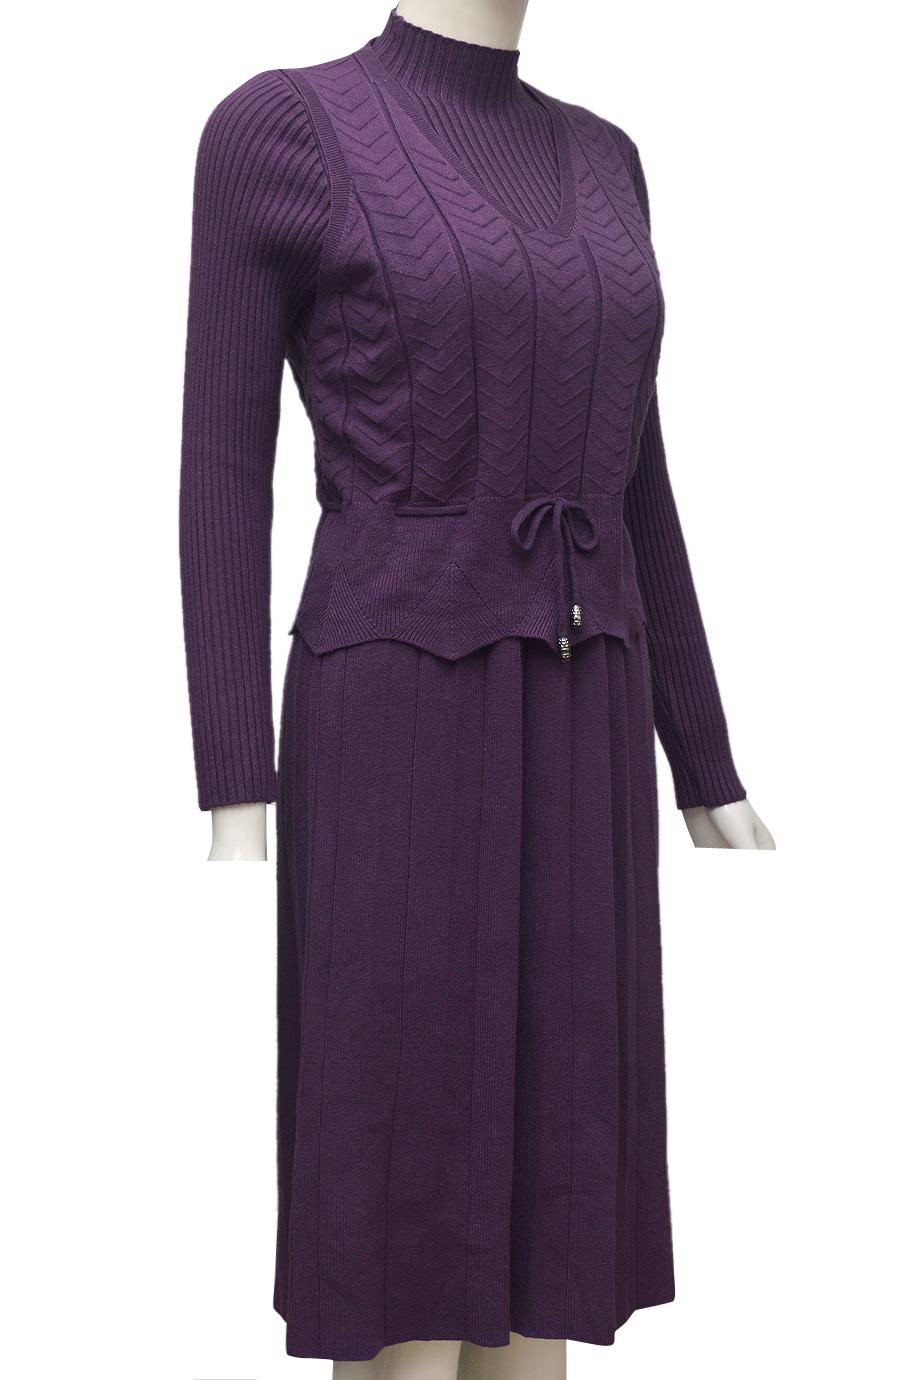 Váy len cặp thời trang ELMI cao cấp màu tím EV46-4